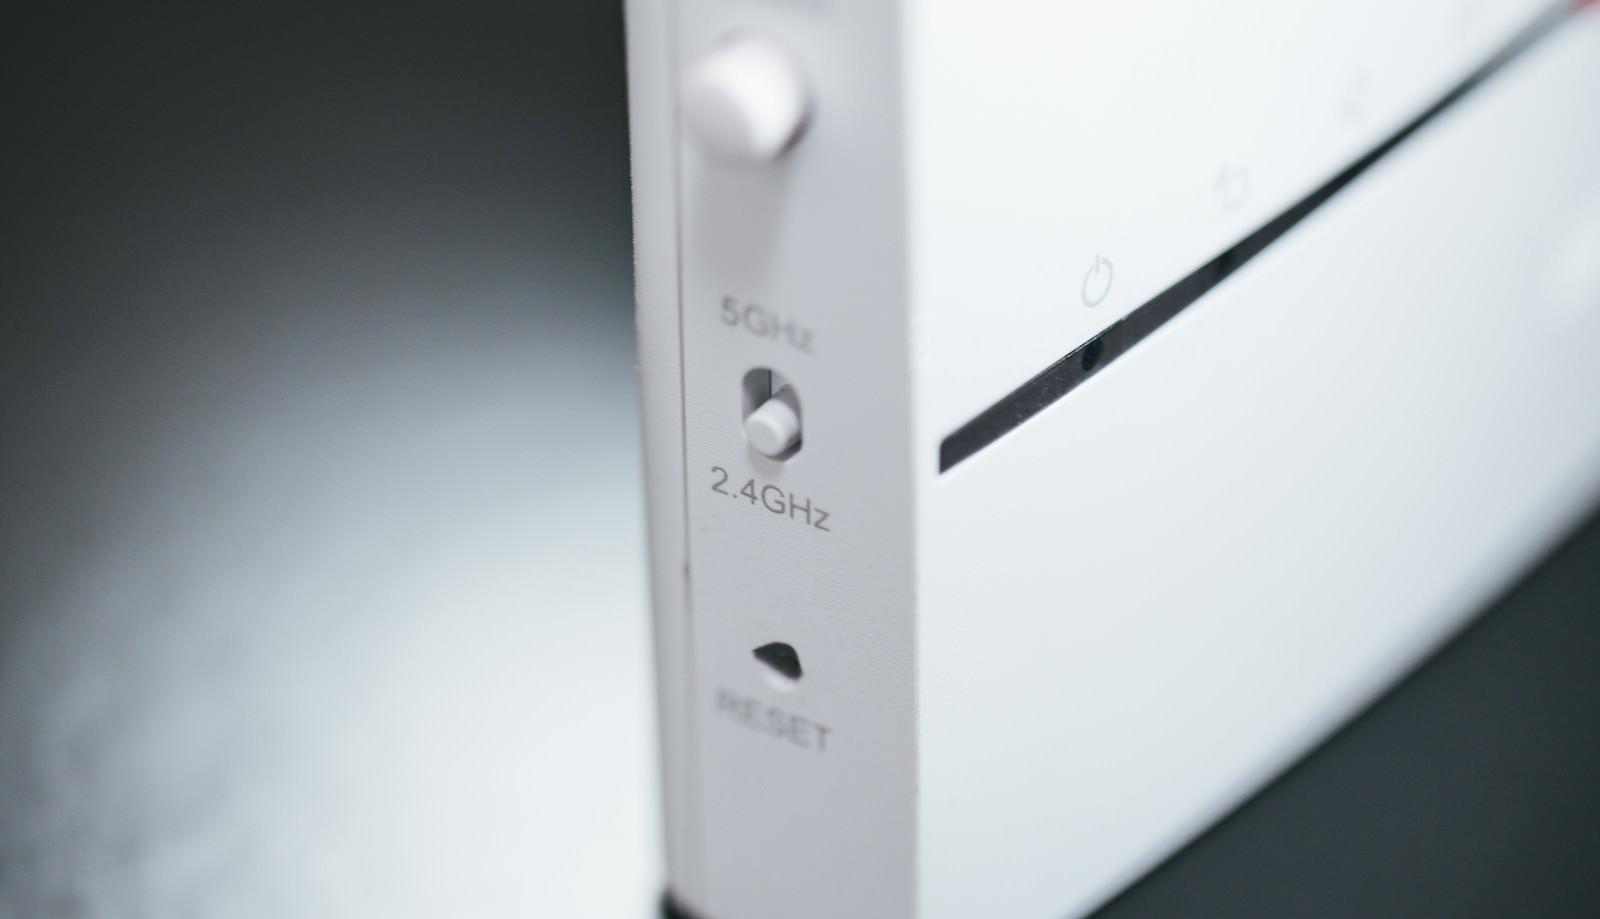 「2.4GHzに切り替え」の写真